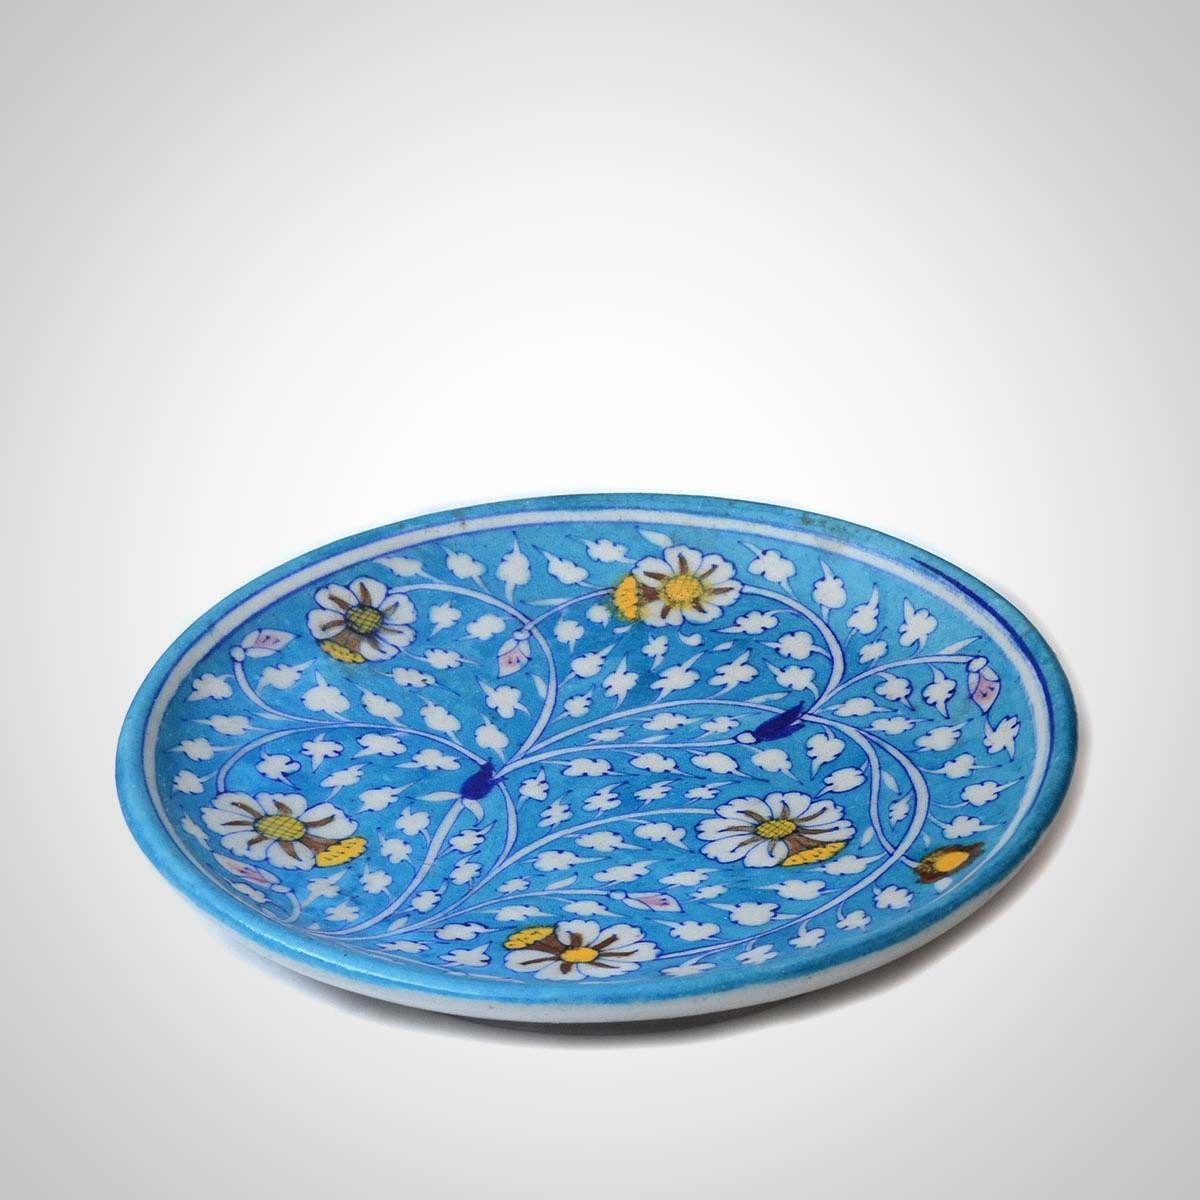 Blue Ceramic Plate - 10 Inches Diameter